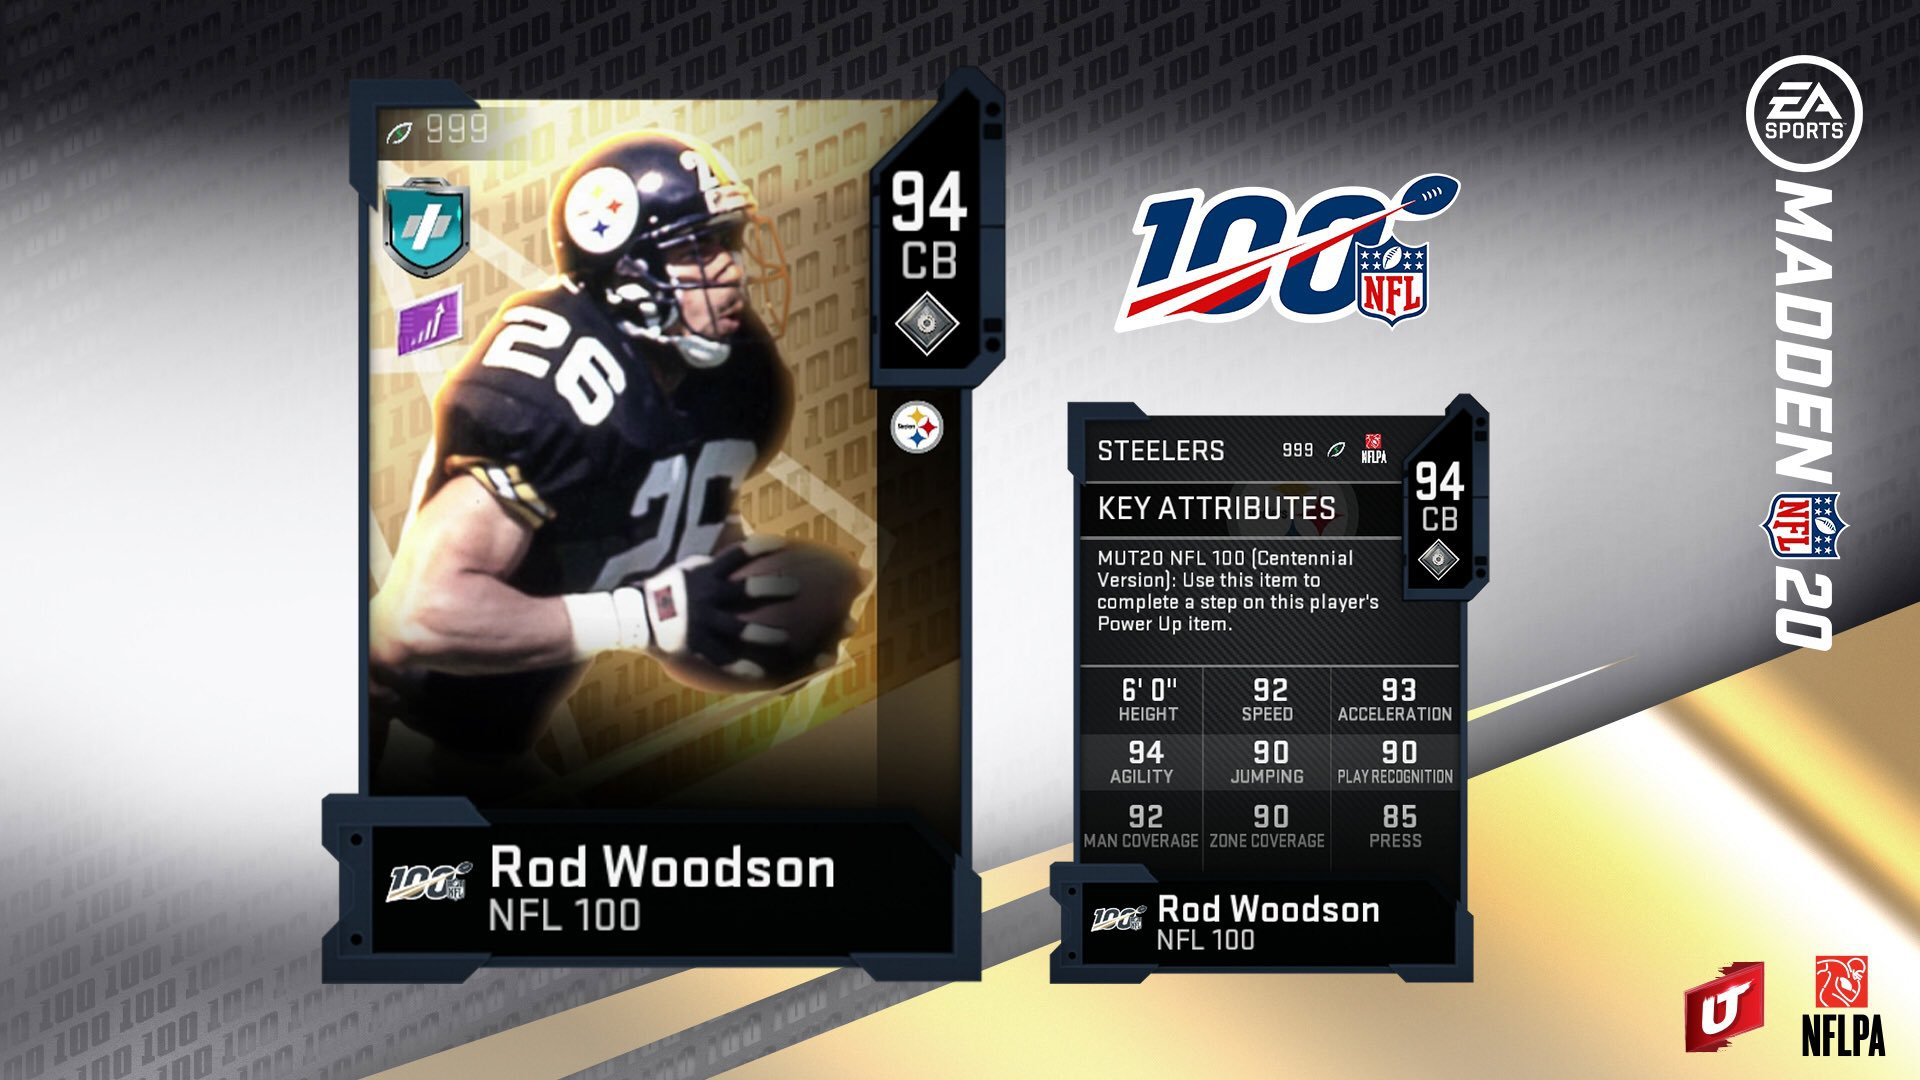 RWoodson100Pic.jpg